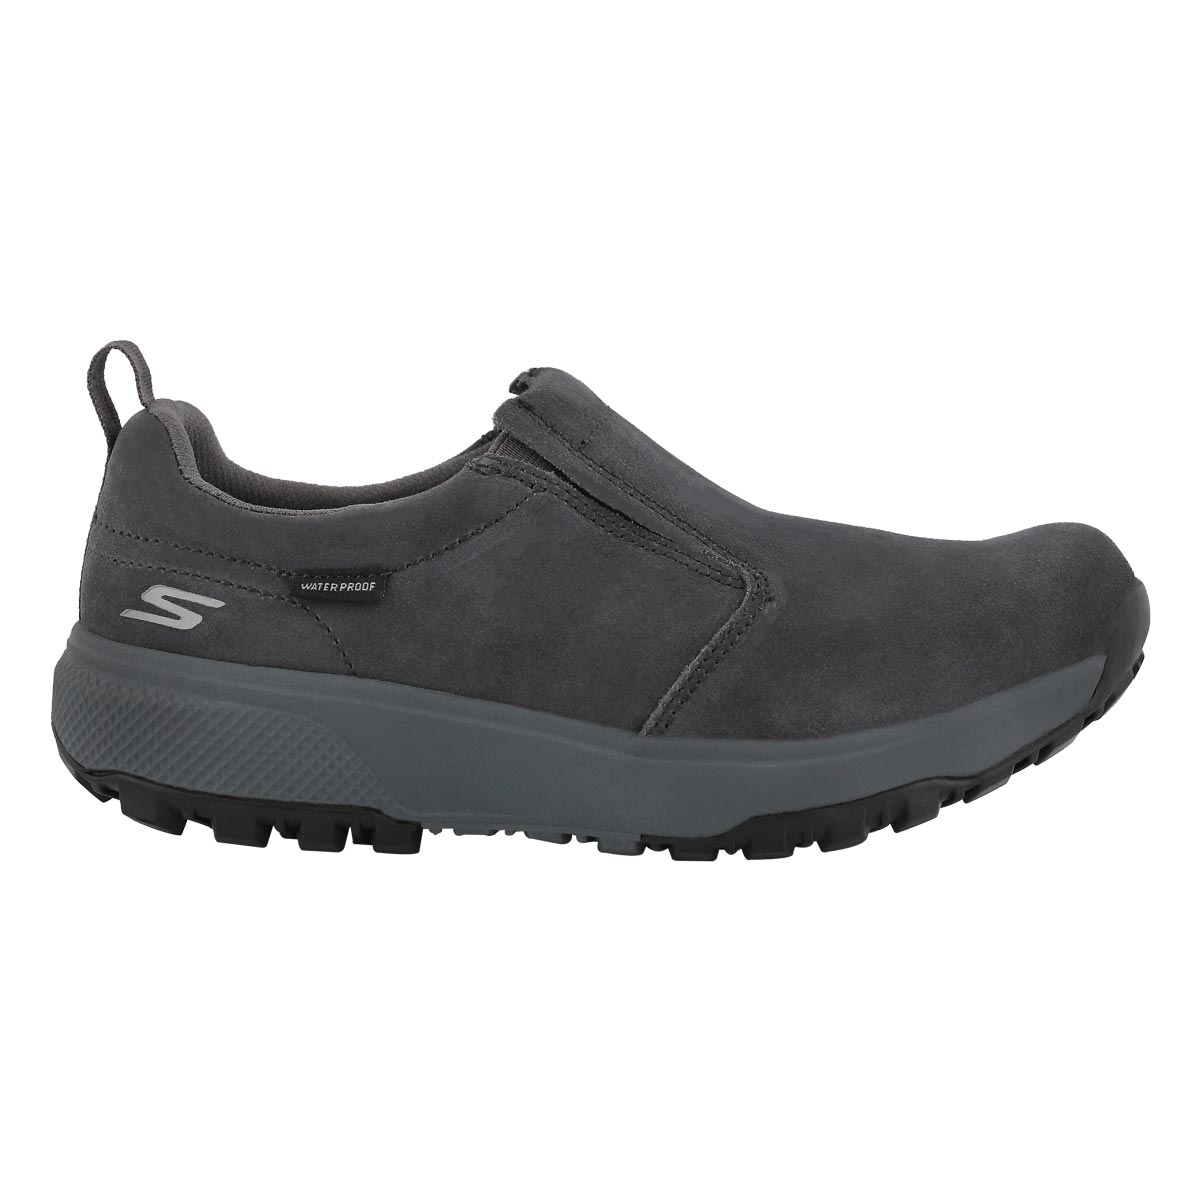 Women's OUTDOOR ULTRA char waterproof slipon shoes